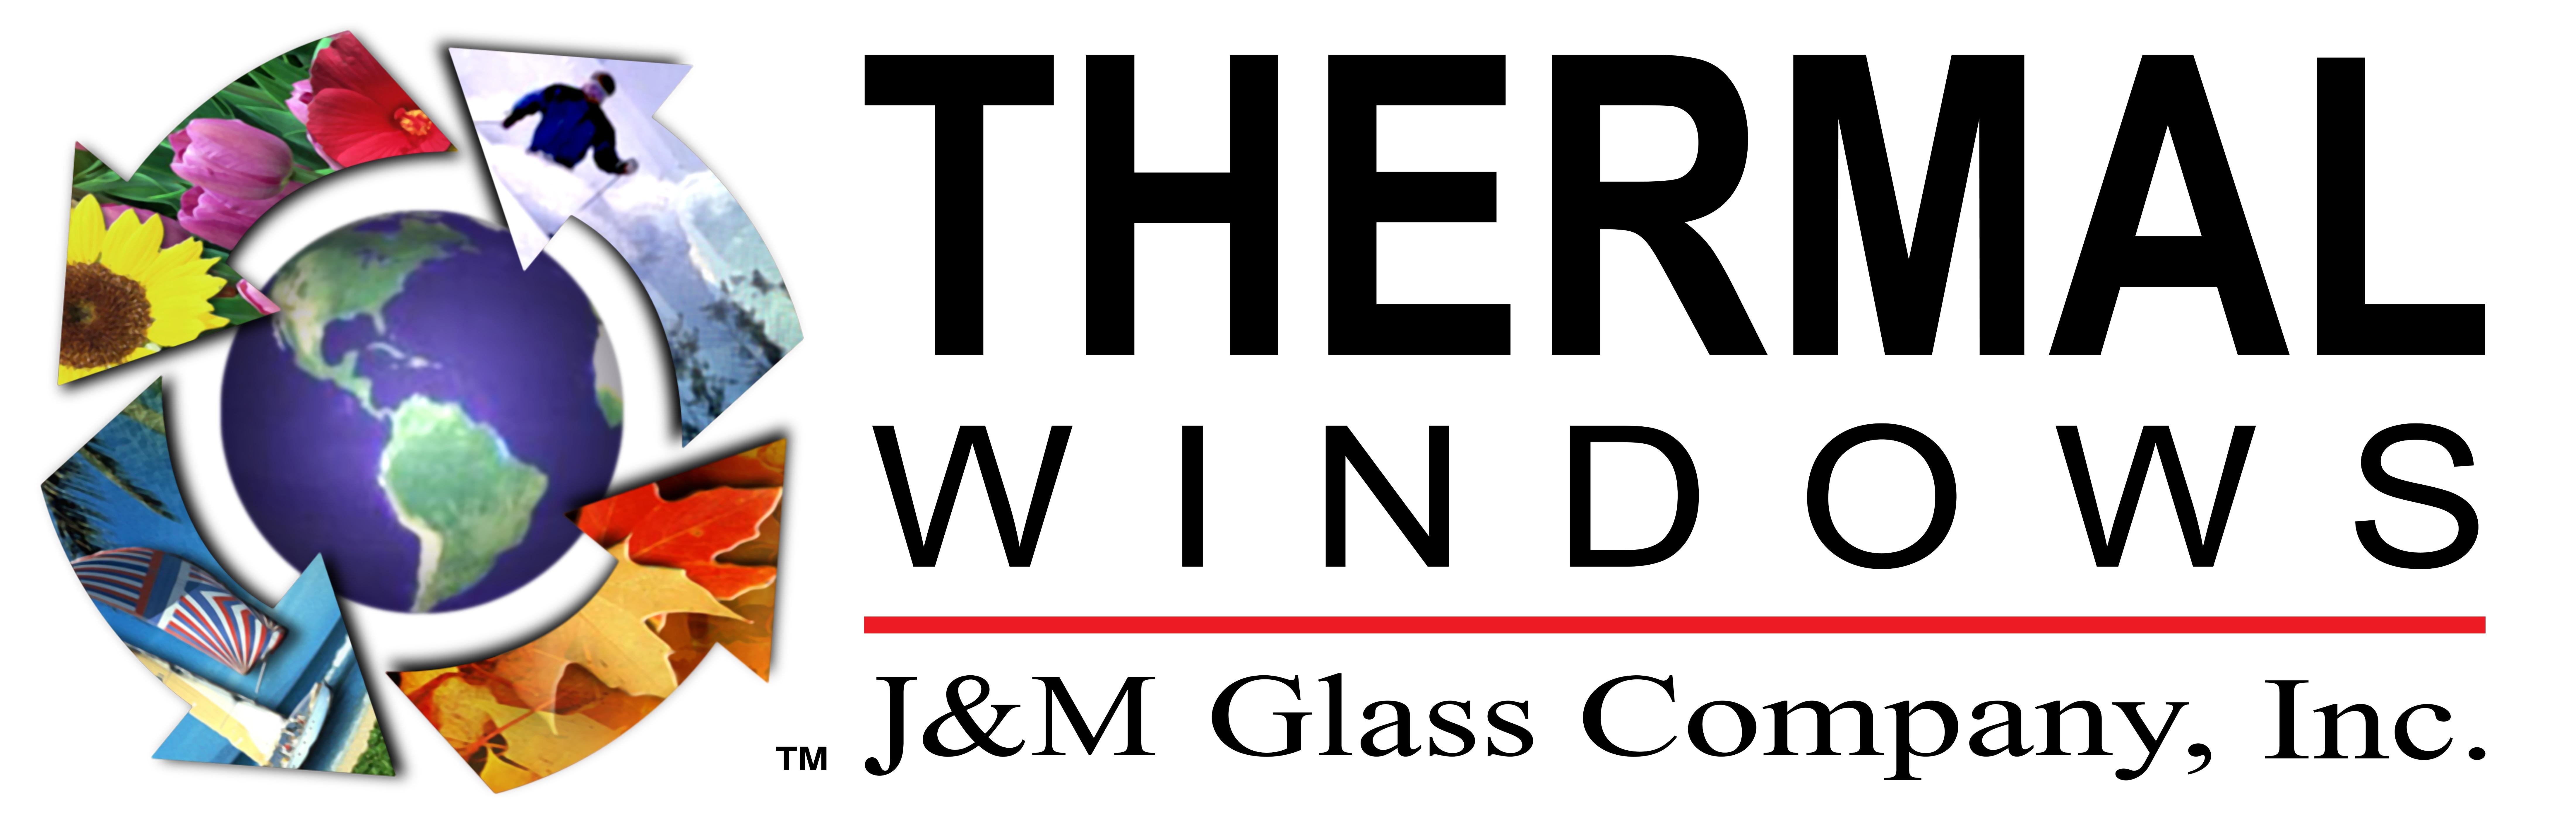 2020 Home Tour - Thermal Windows logo